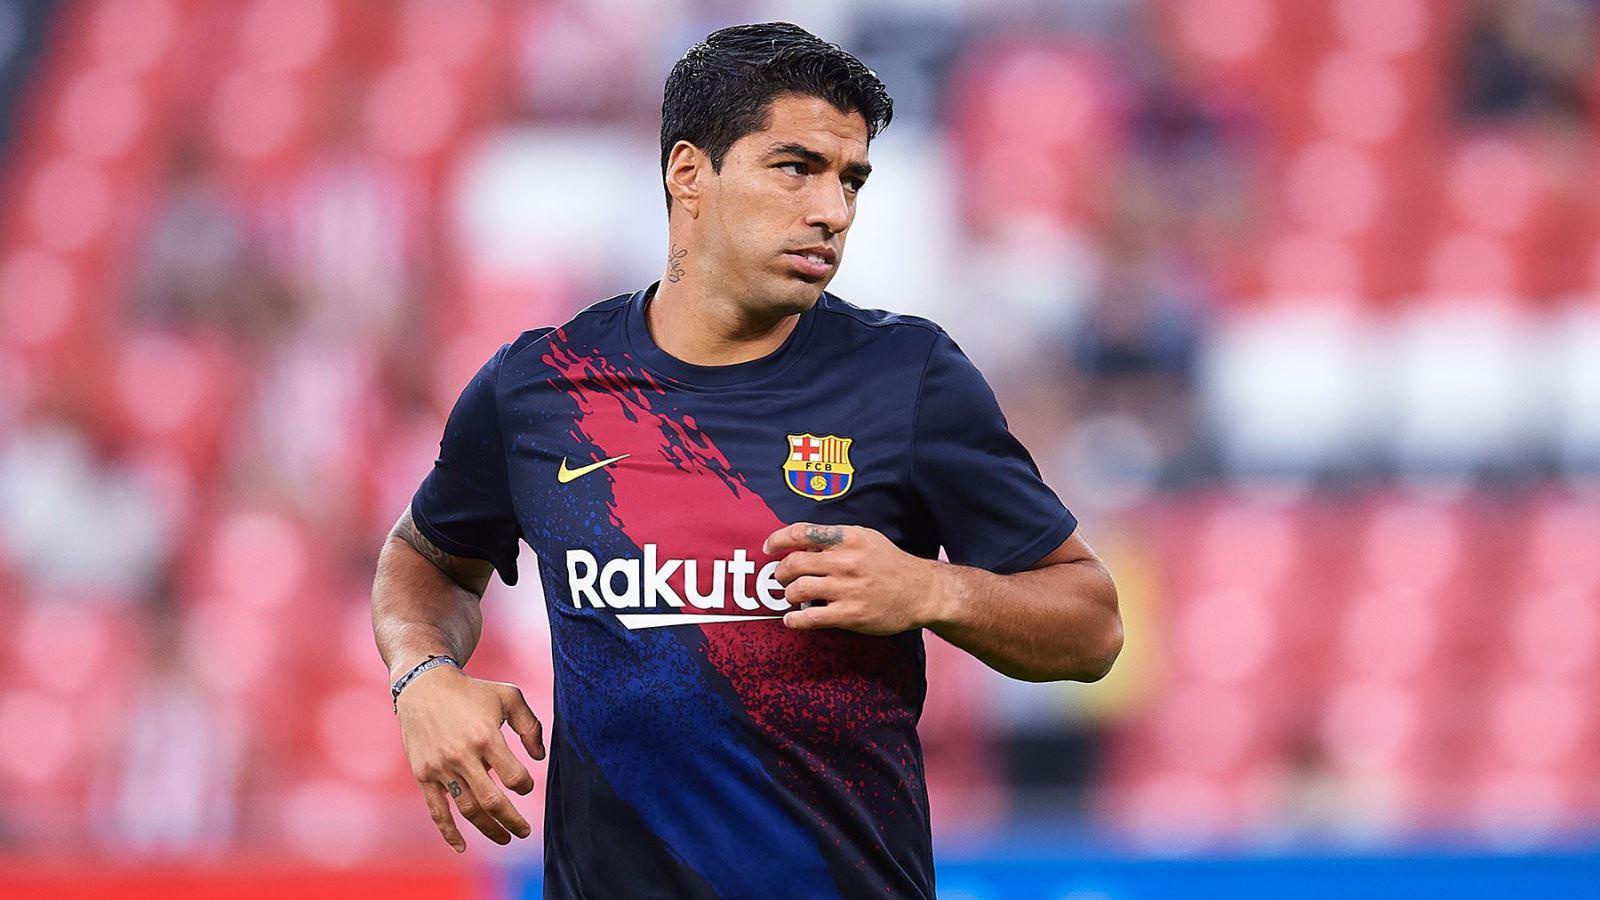 bóng đá, mu, chuyển nhượng, tin chuyển nhượng, manchester united, de gea, alexis sanchez, neymar, jadon sancho, luis suarez, eriksen, tottenham, barcelona, real madrid, psg, juventus